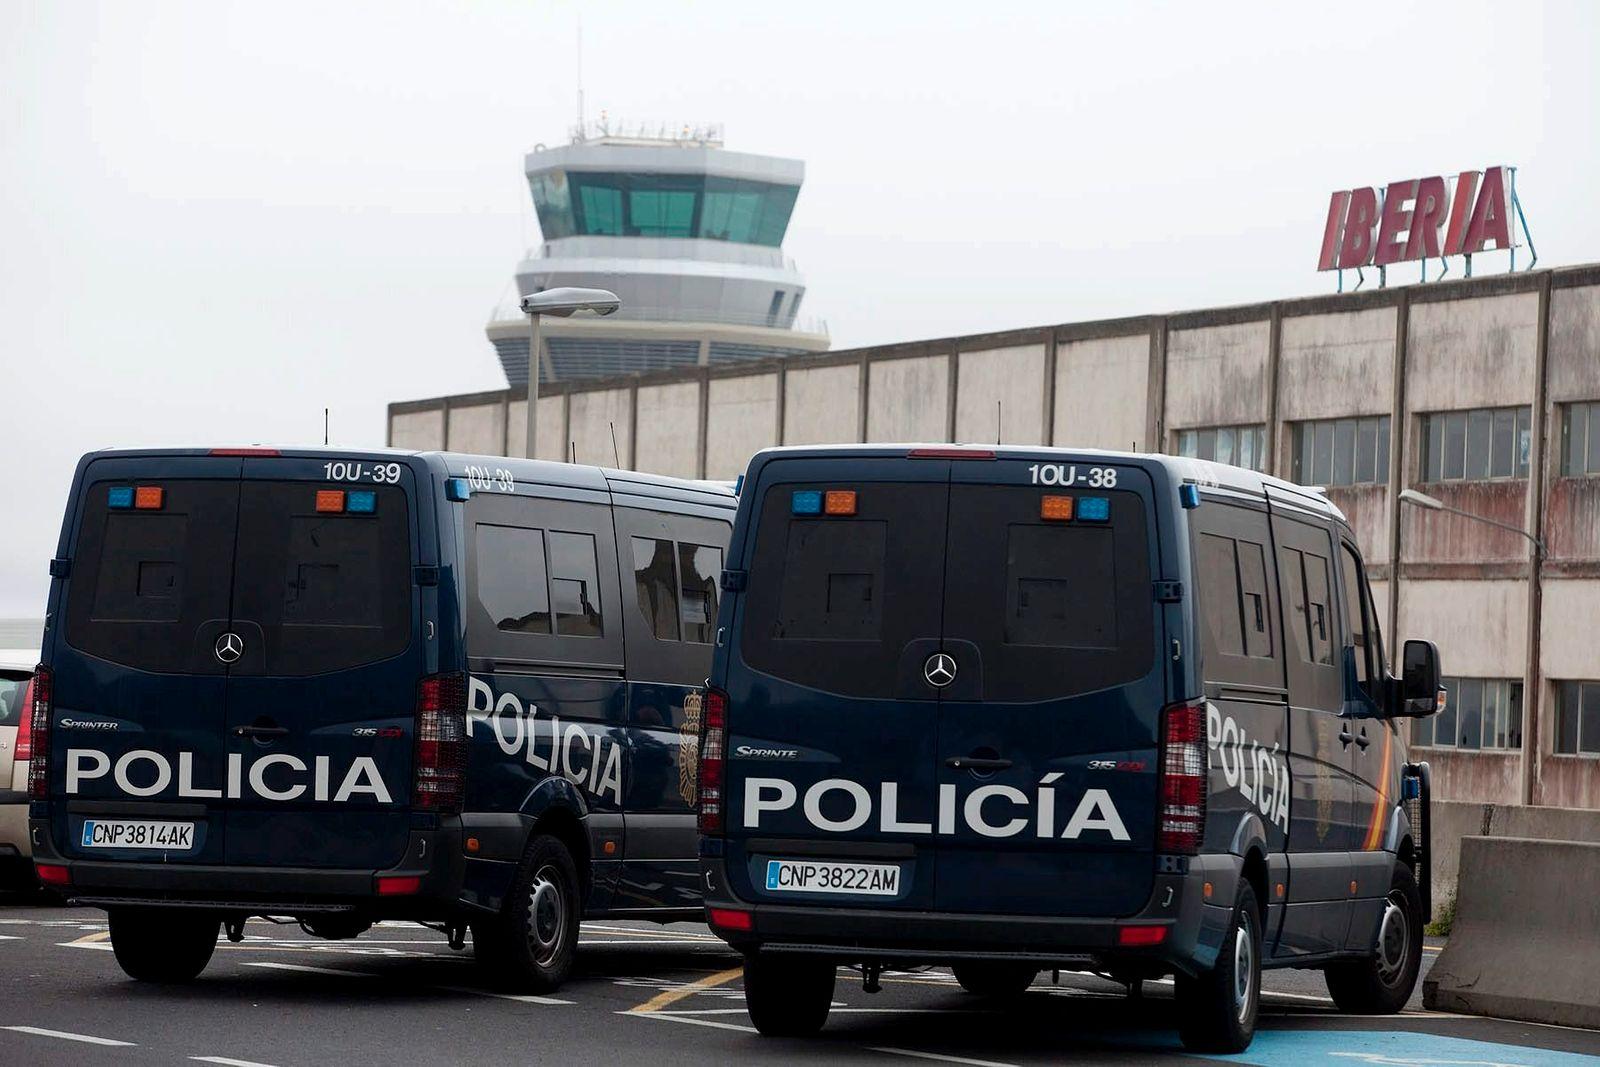 Spanish air traffic controllers strike